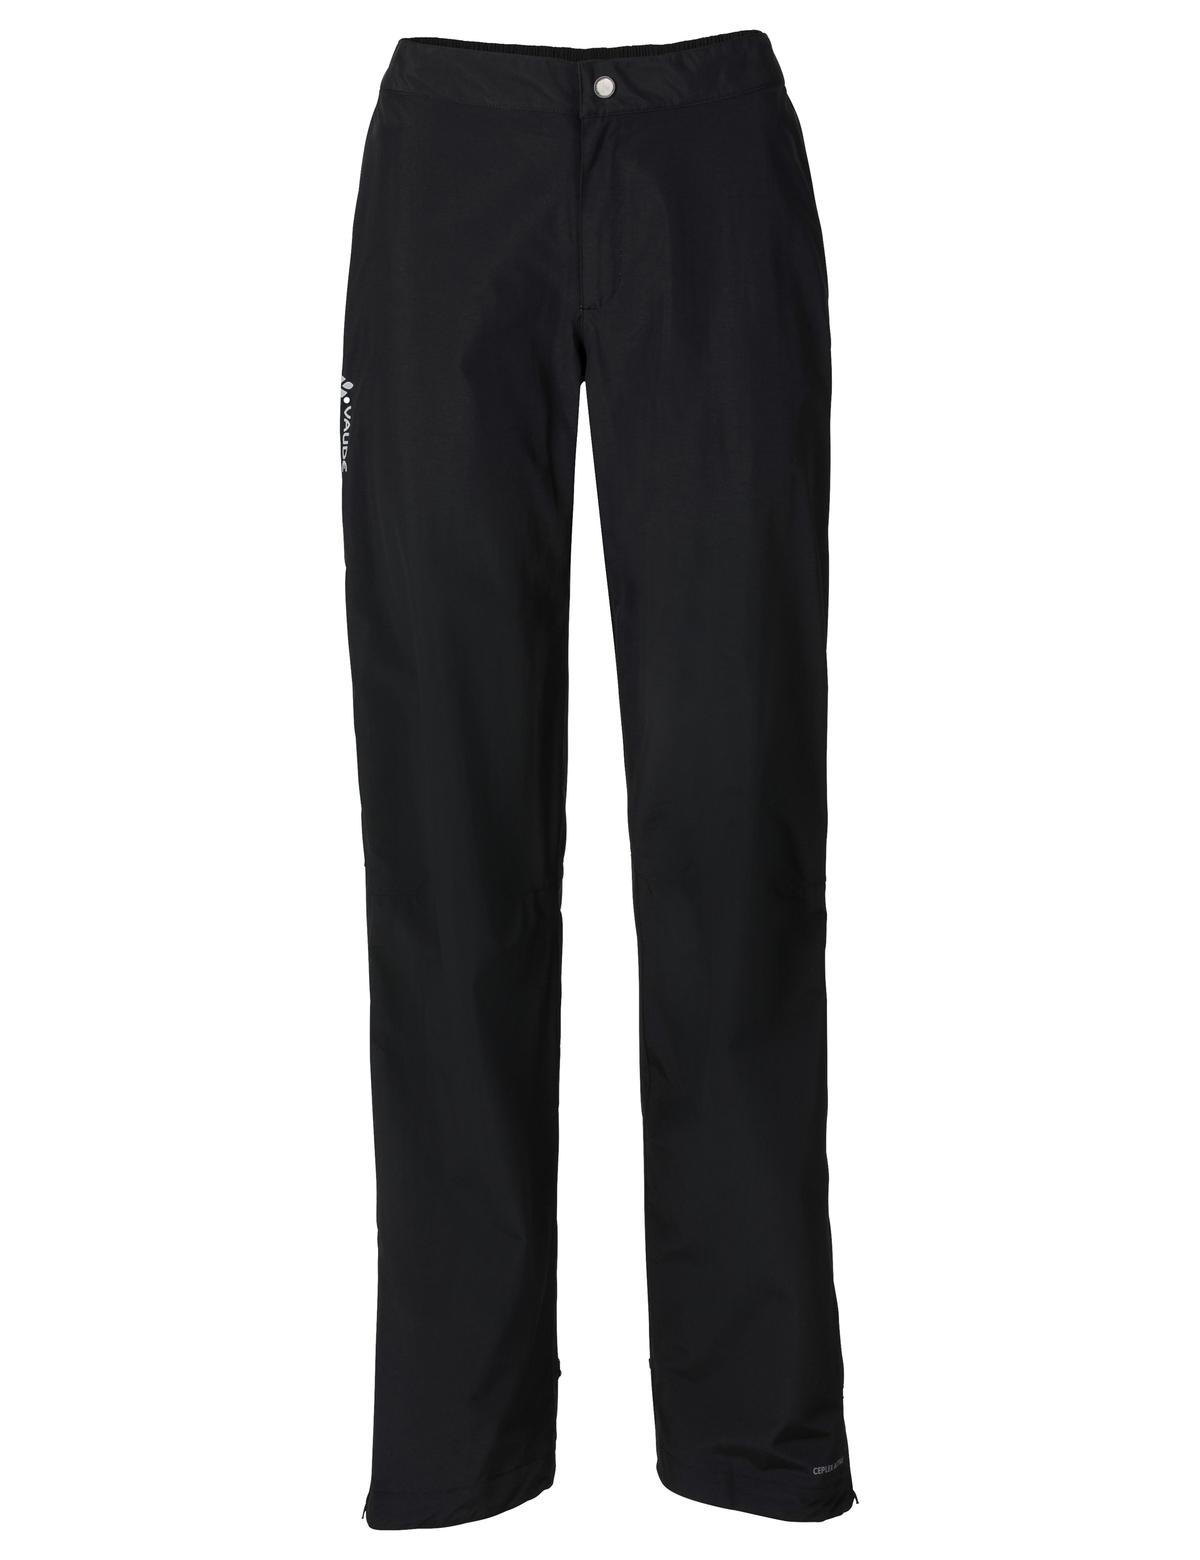 VAUDE Women´s Yaras Rain Pants II black Größe 34-Long - VAUDE Women´s Yaras Rain Pants II black Größe 34-Long